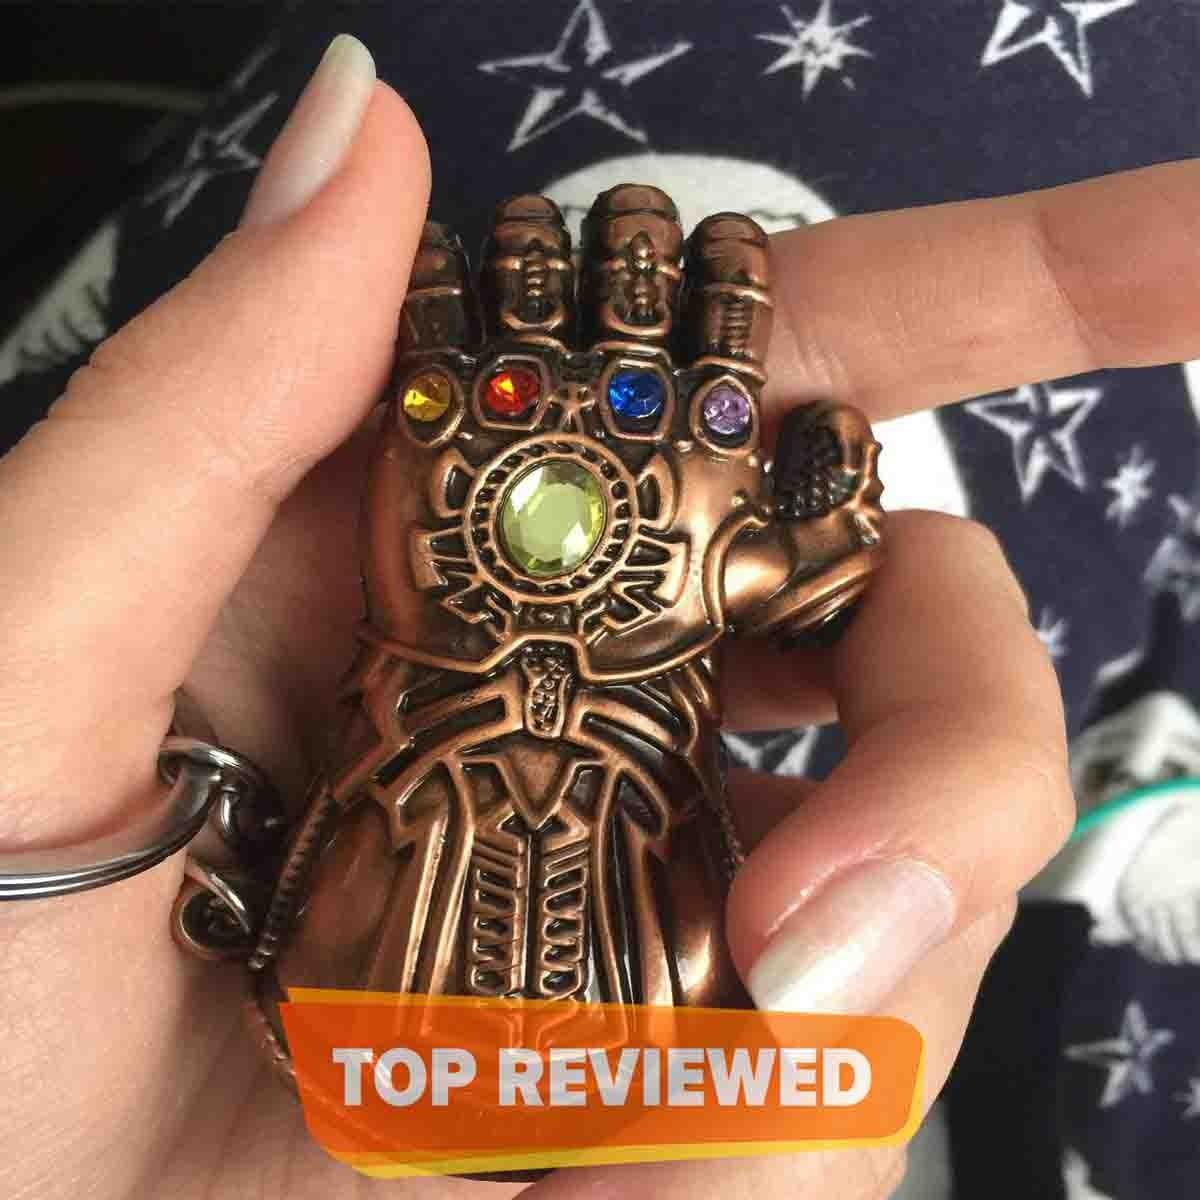 Thanos Infinity Gauntlet Metal Keychain - Avengers Infinity War Original Marvel Merchandise